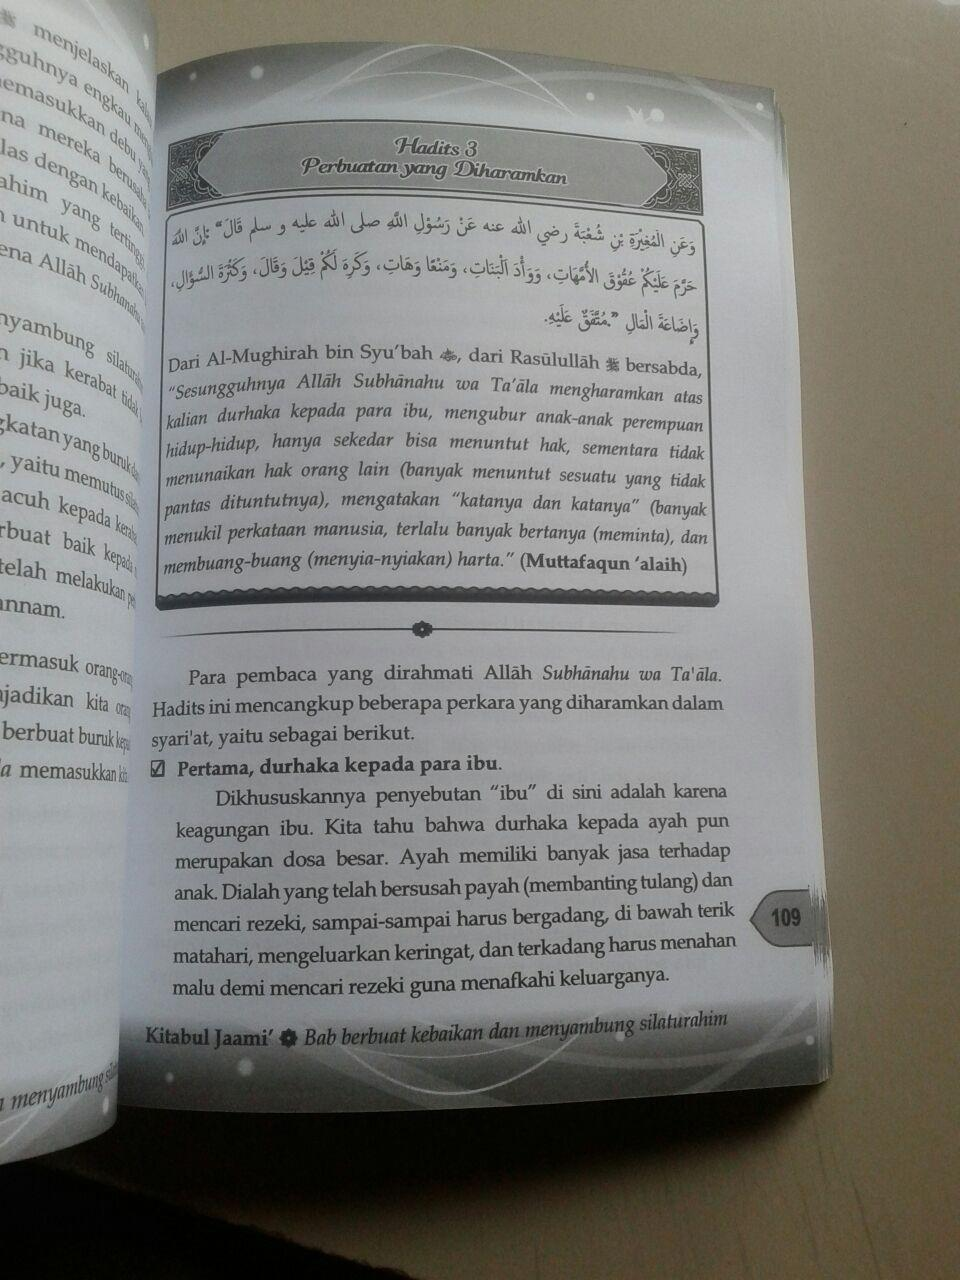 Buku Muslim Yang Sempurna Imannya Yang Paling Baik Akhlaknya isi 2